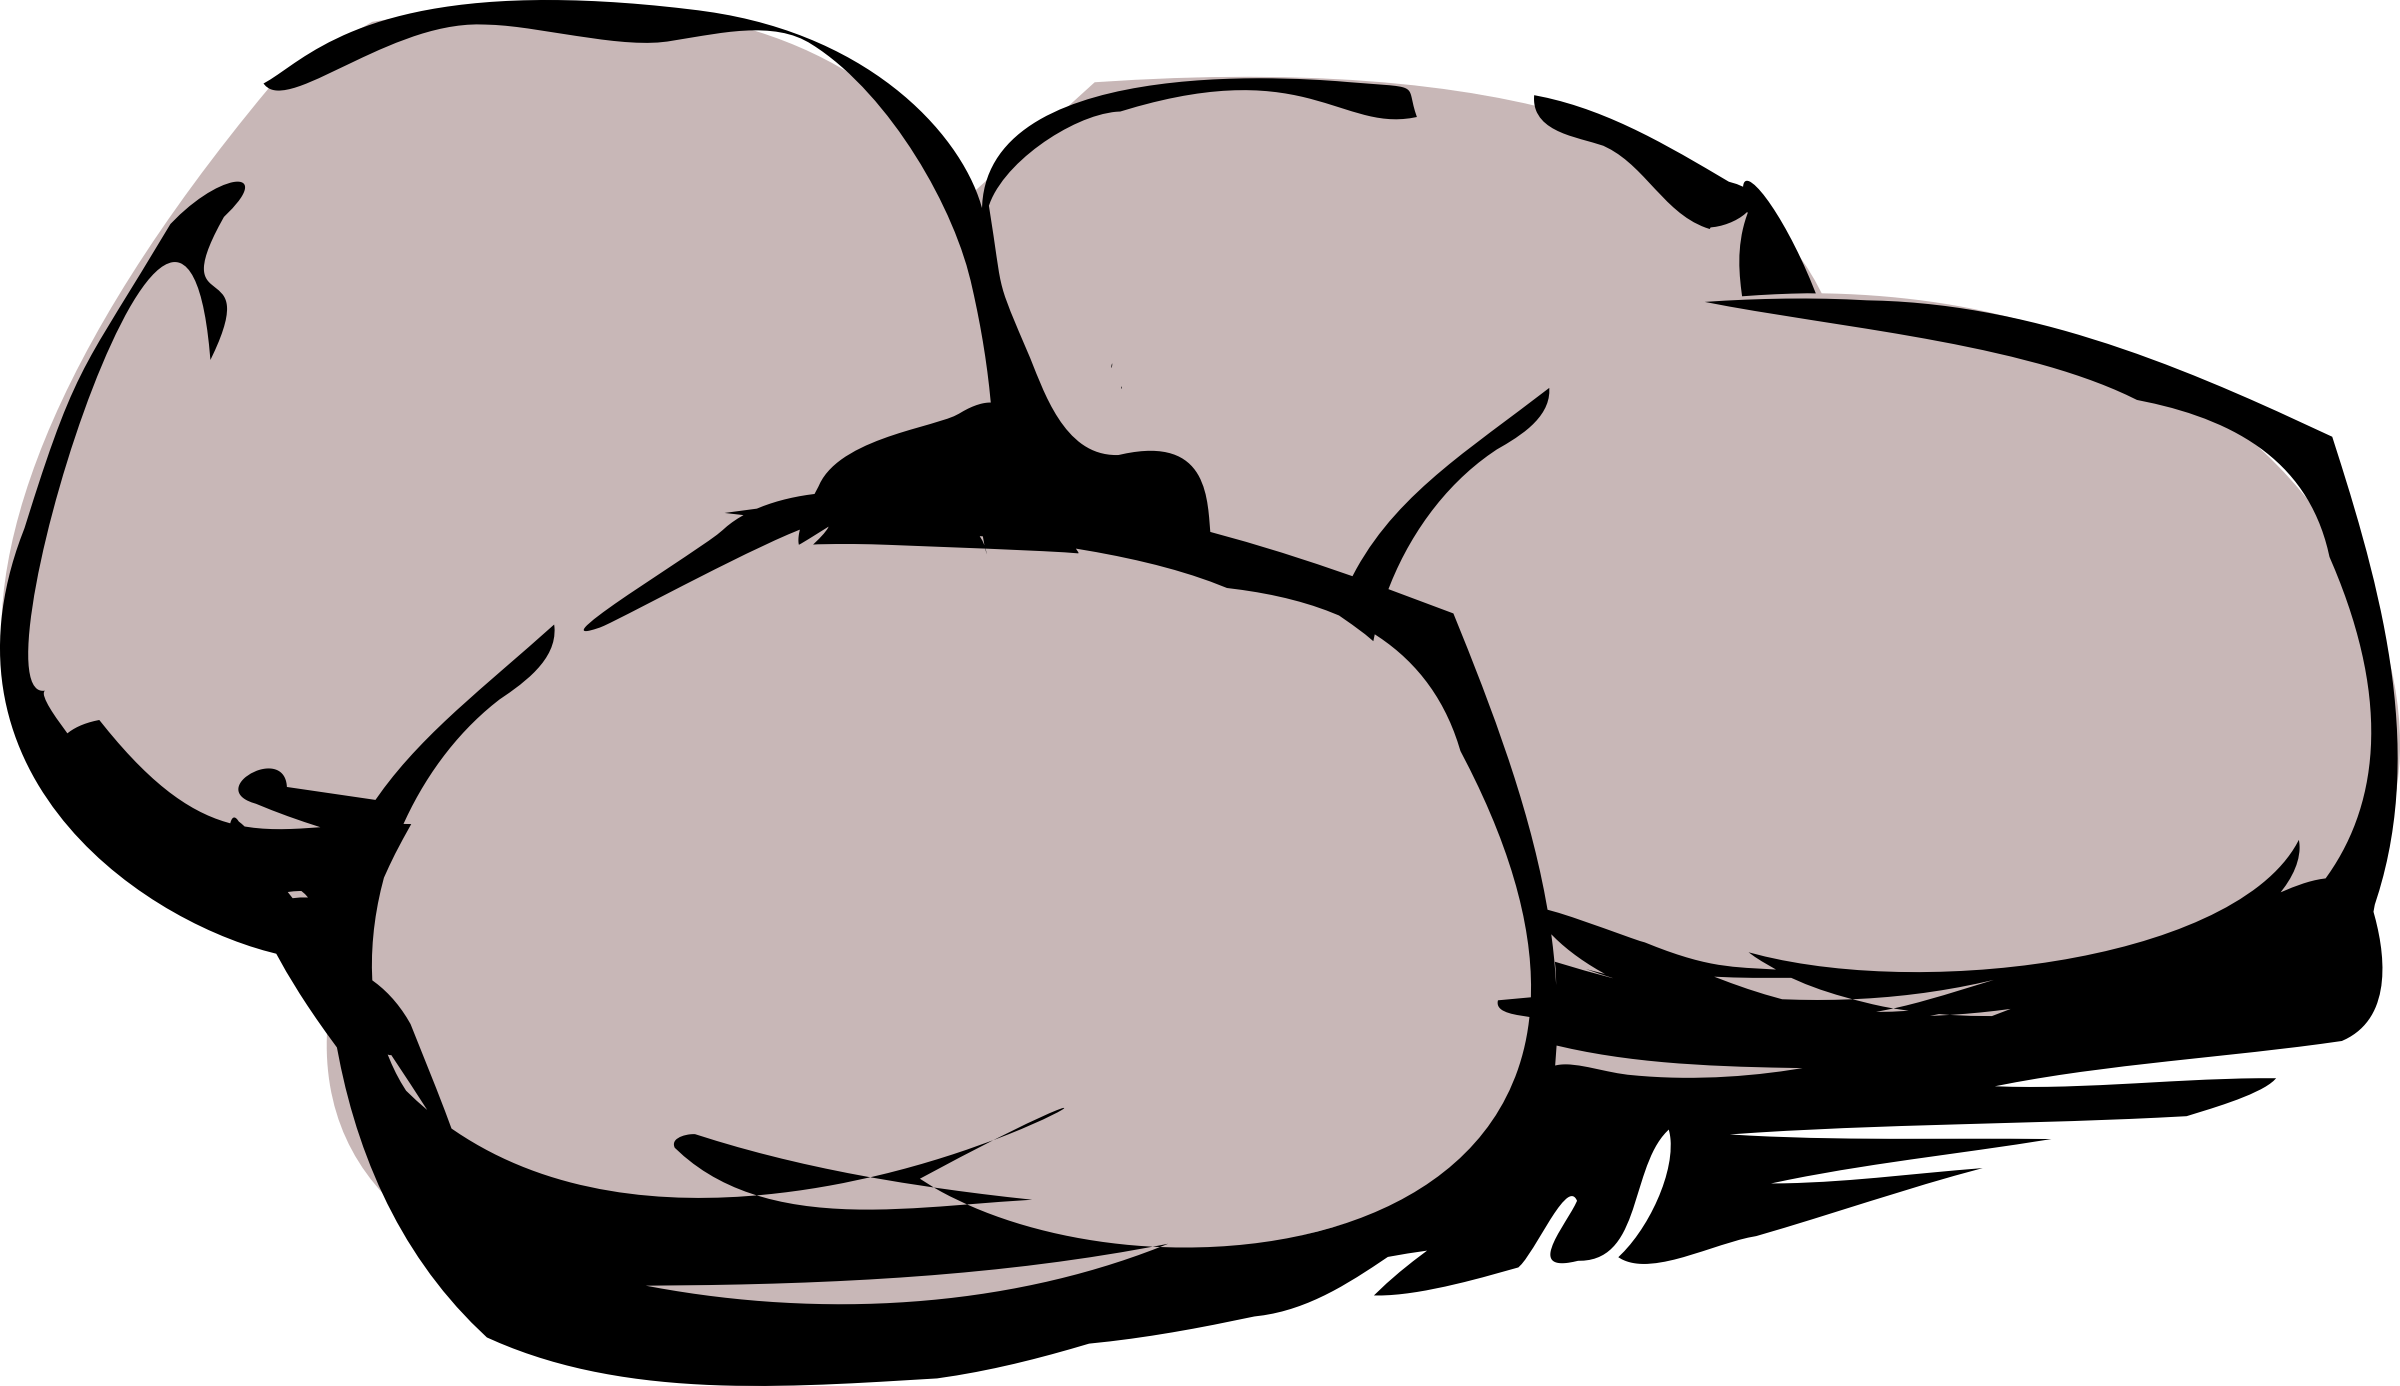 Boulders svg #19, Download drawings